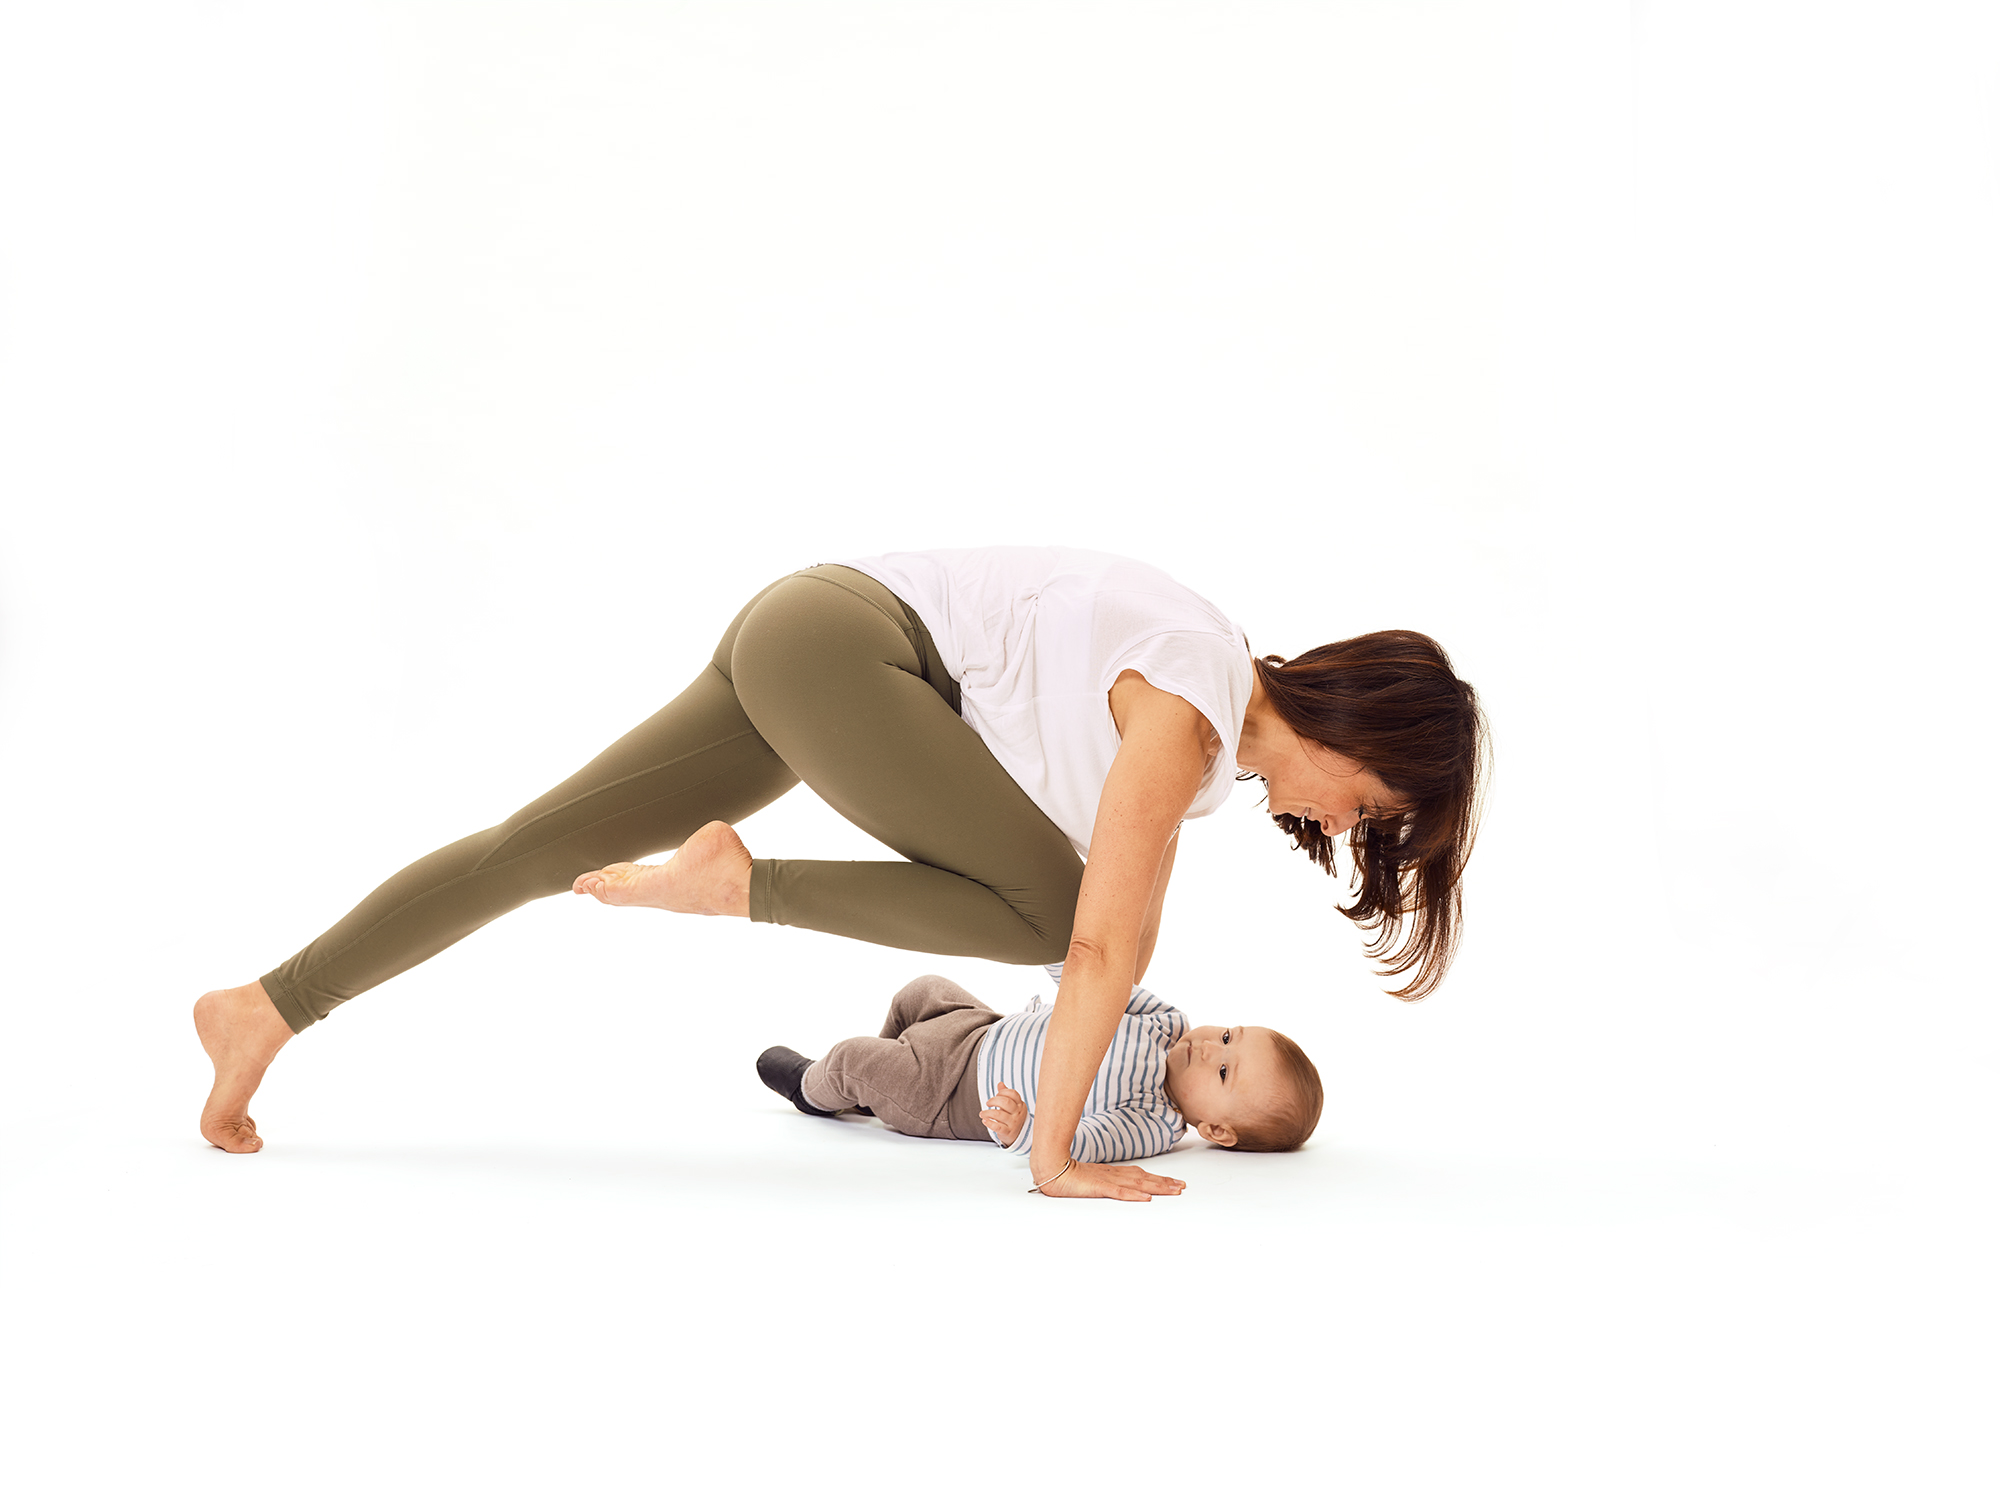 Baby & me - Rückbildungsyoga